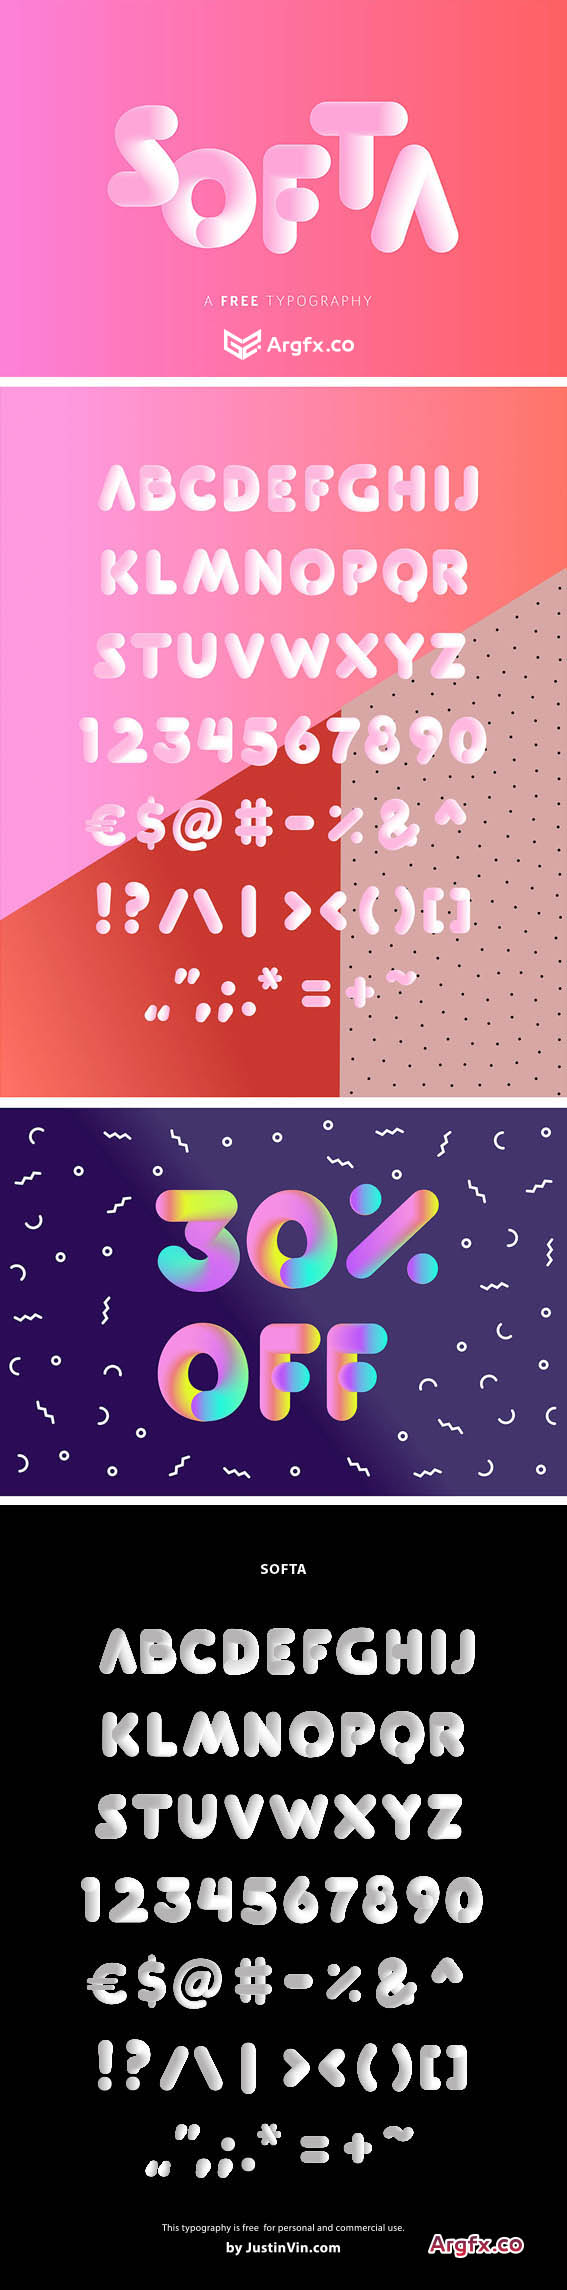 Softa Vector Typeface in PDF